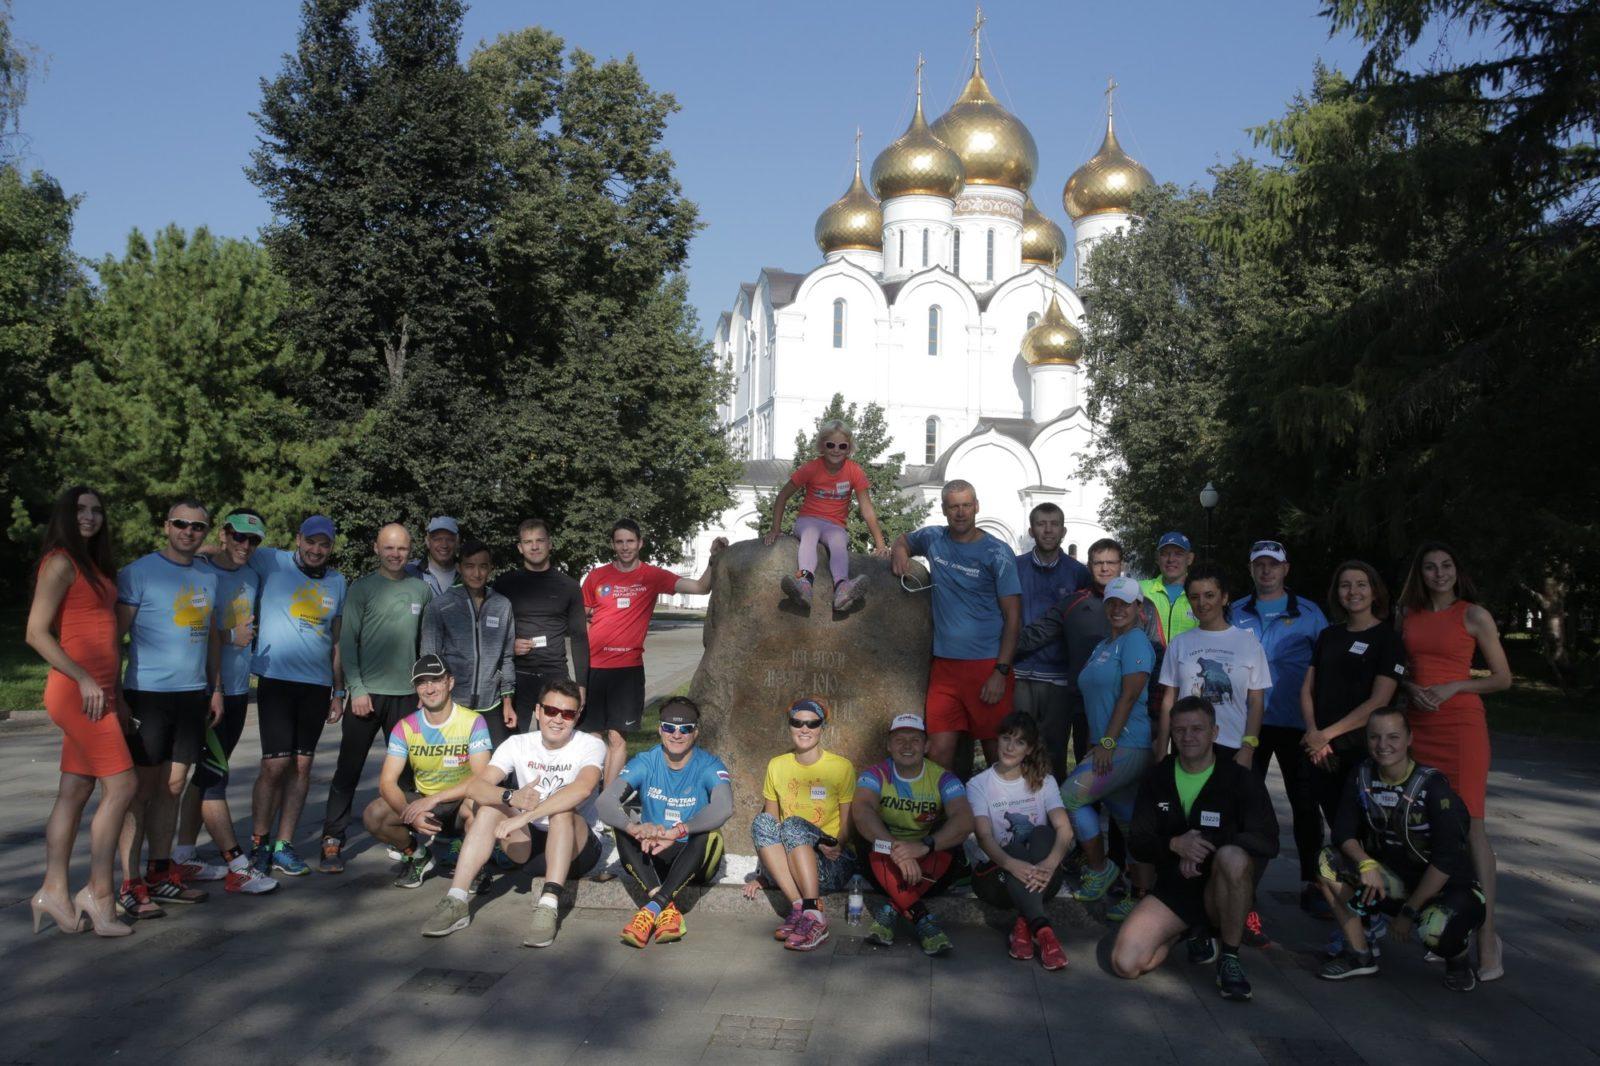 КУДА И КАК БЕЖИТ РОССИЯ? ИТОГИ V КОНФЕРЕНЦИИ RUSSIARUNNING